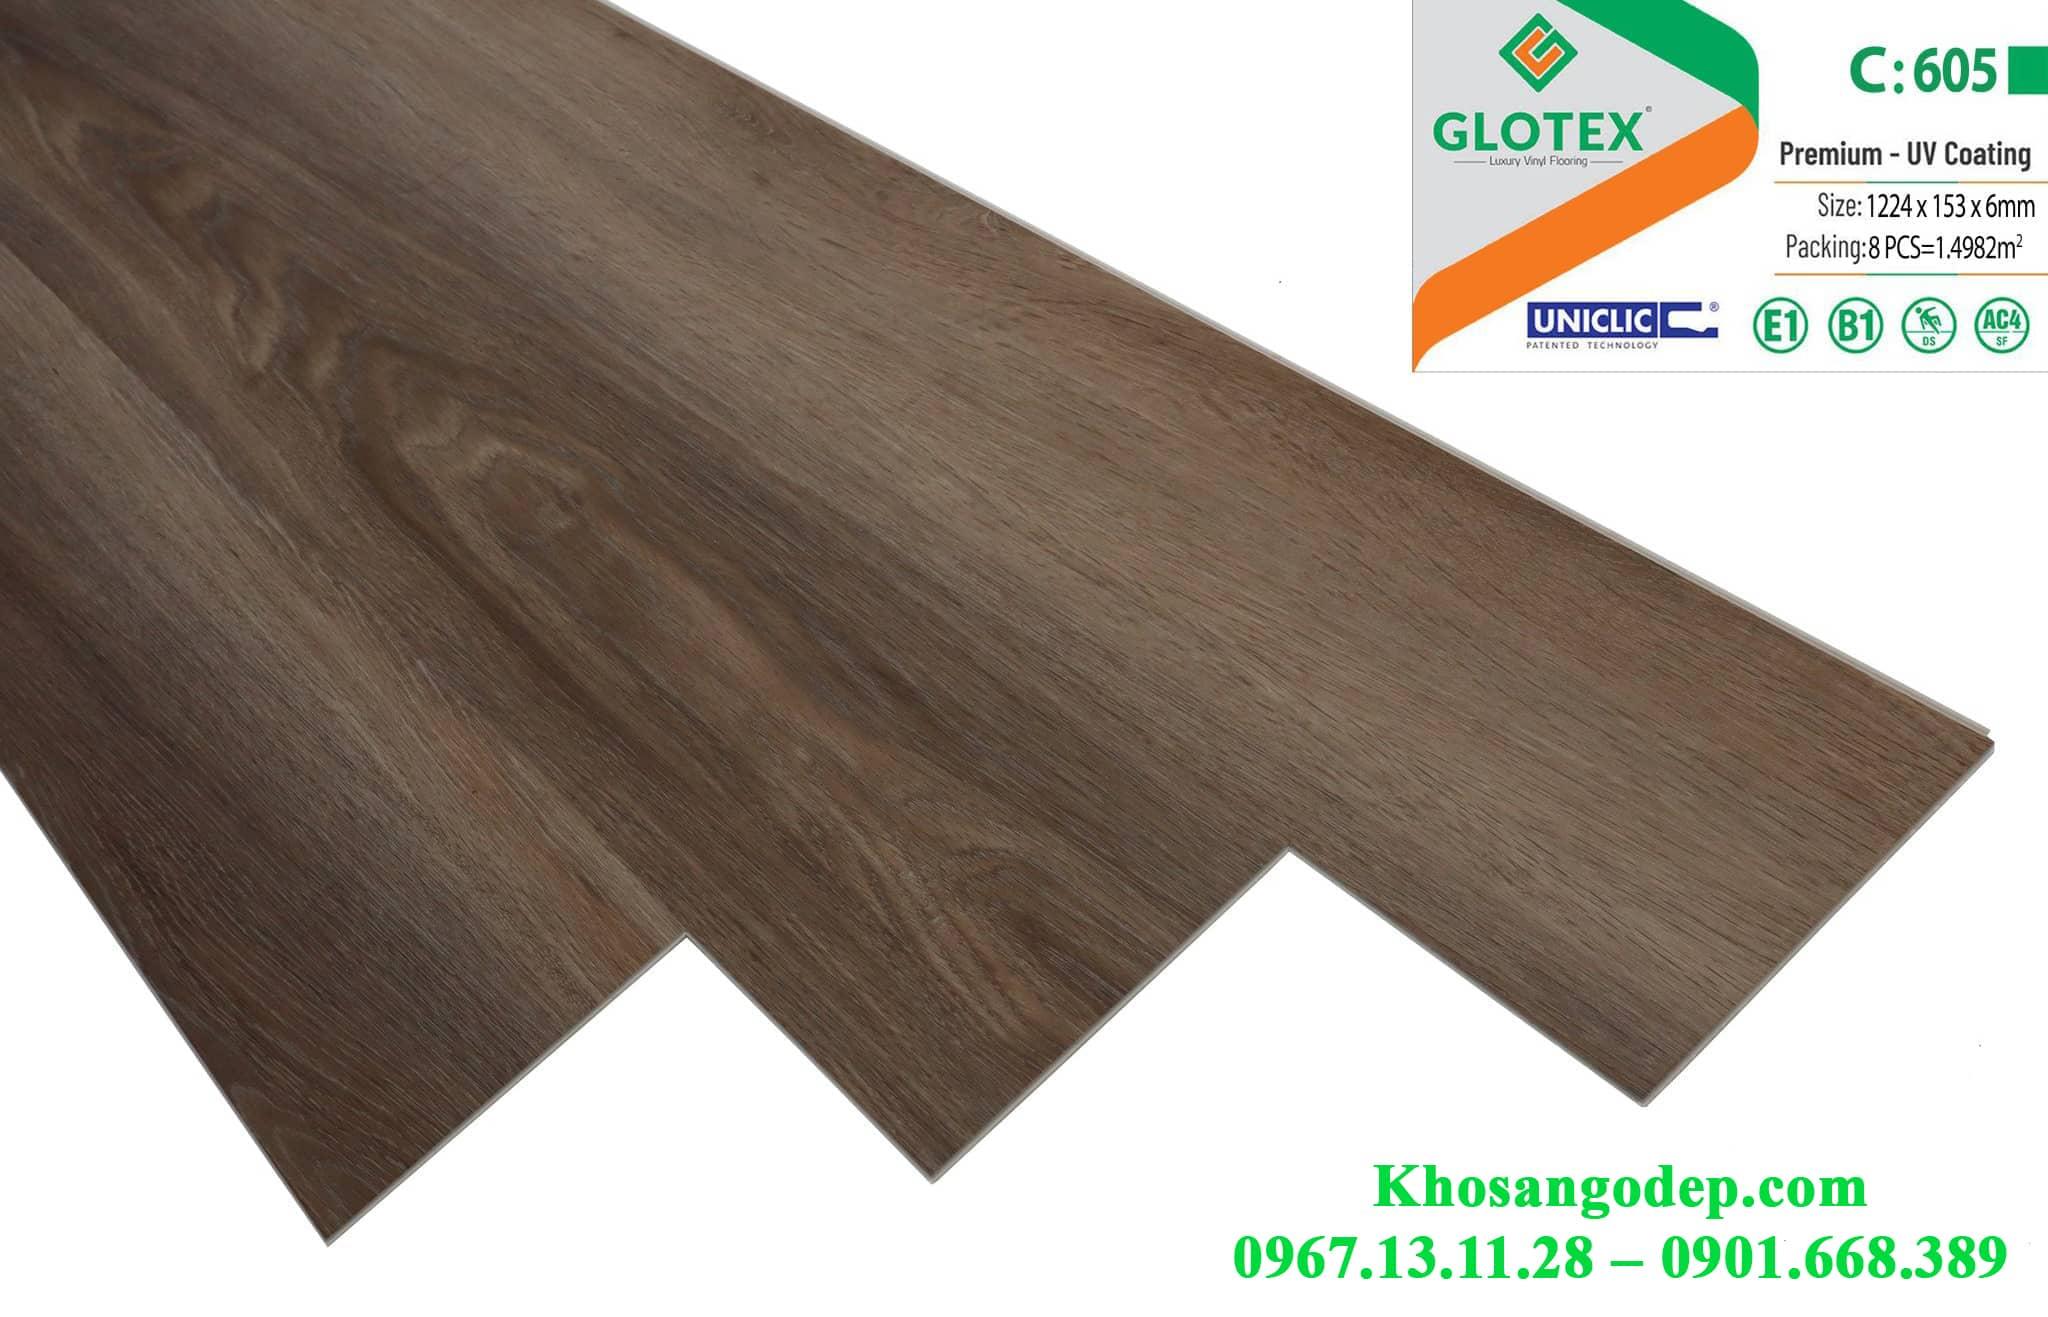 Sàn nhựa Glotex 6mm C605